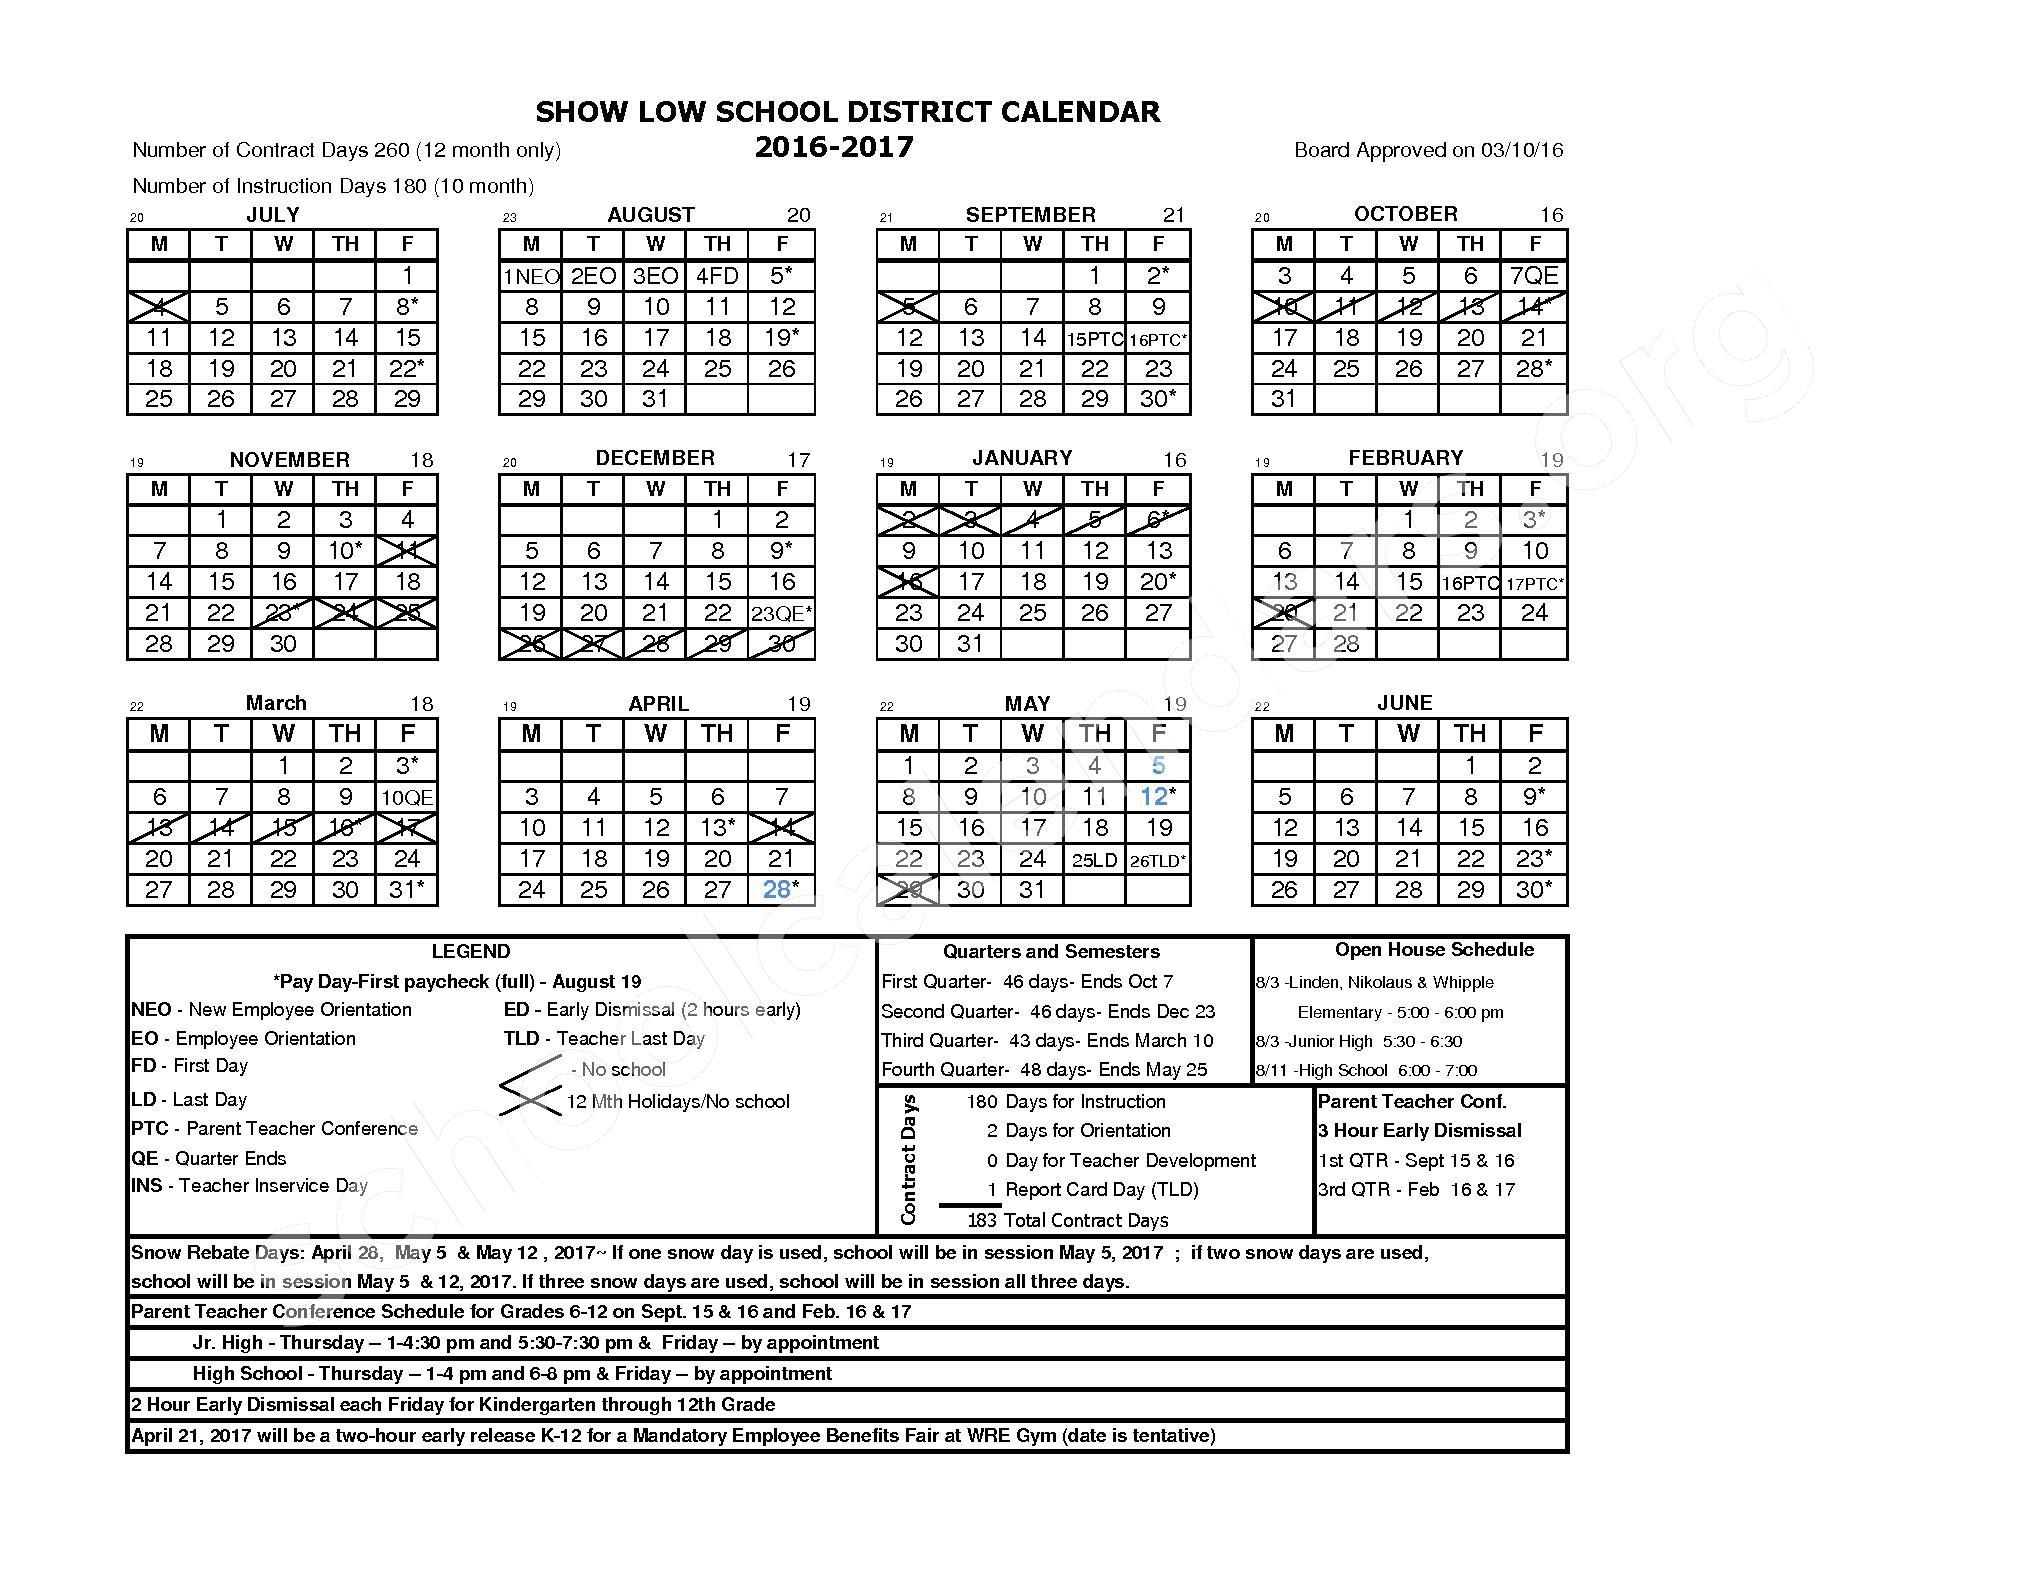 2016 - 2017 District Calendar – Corunna Public School District – page 1